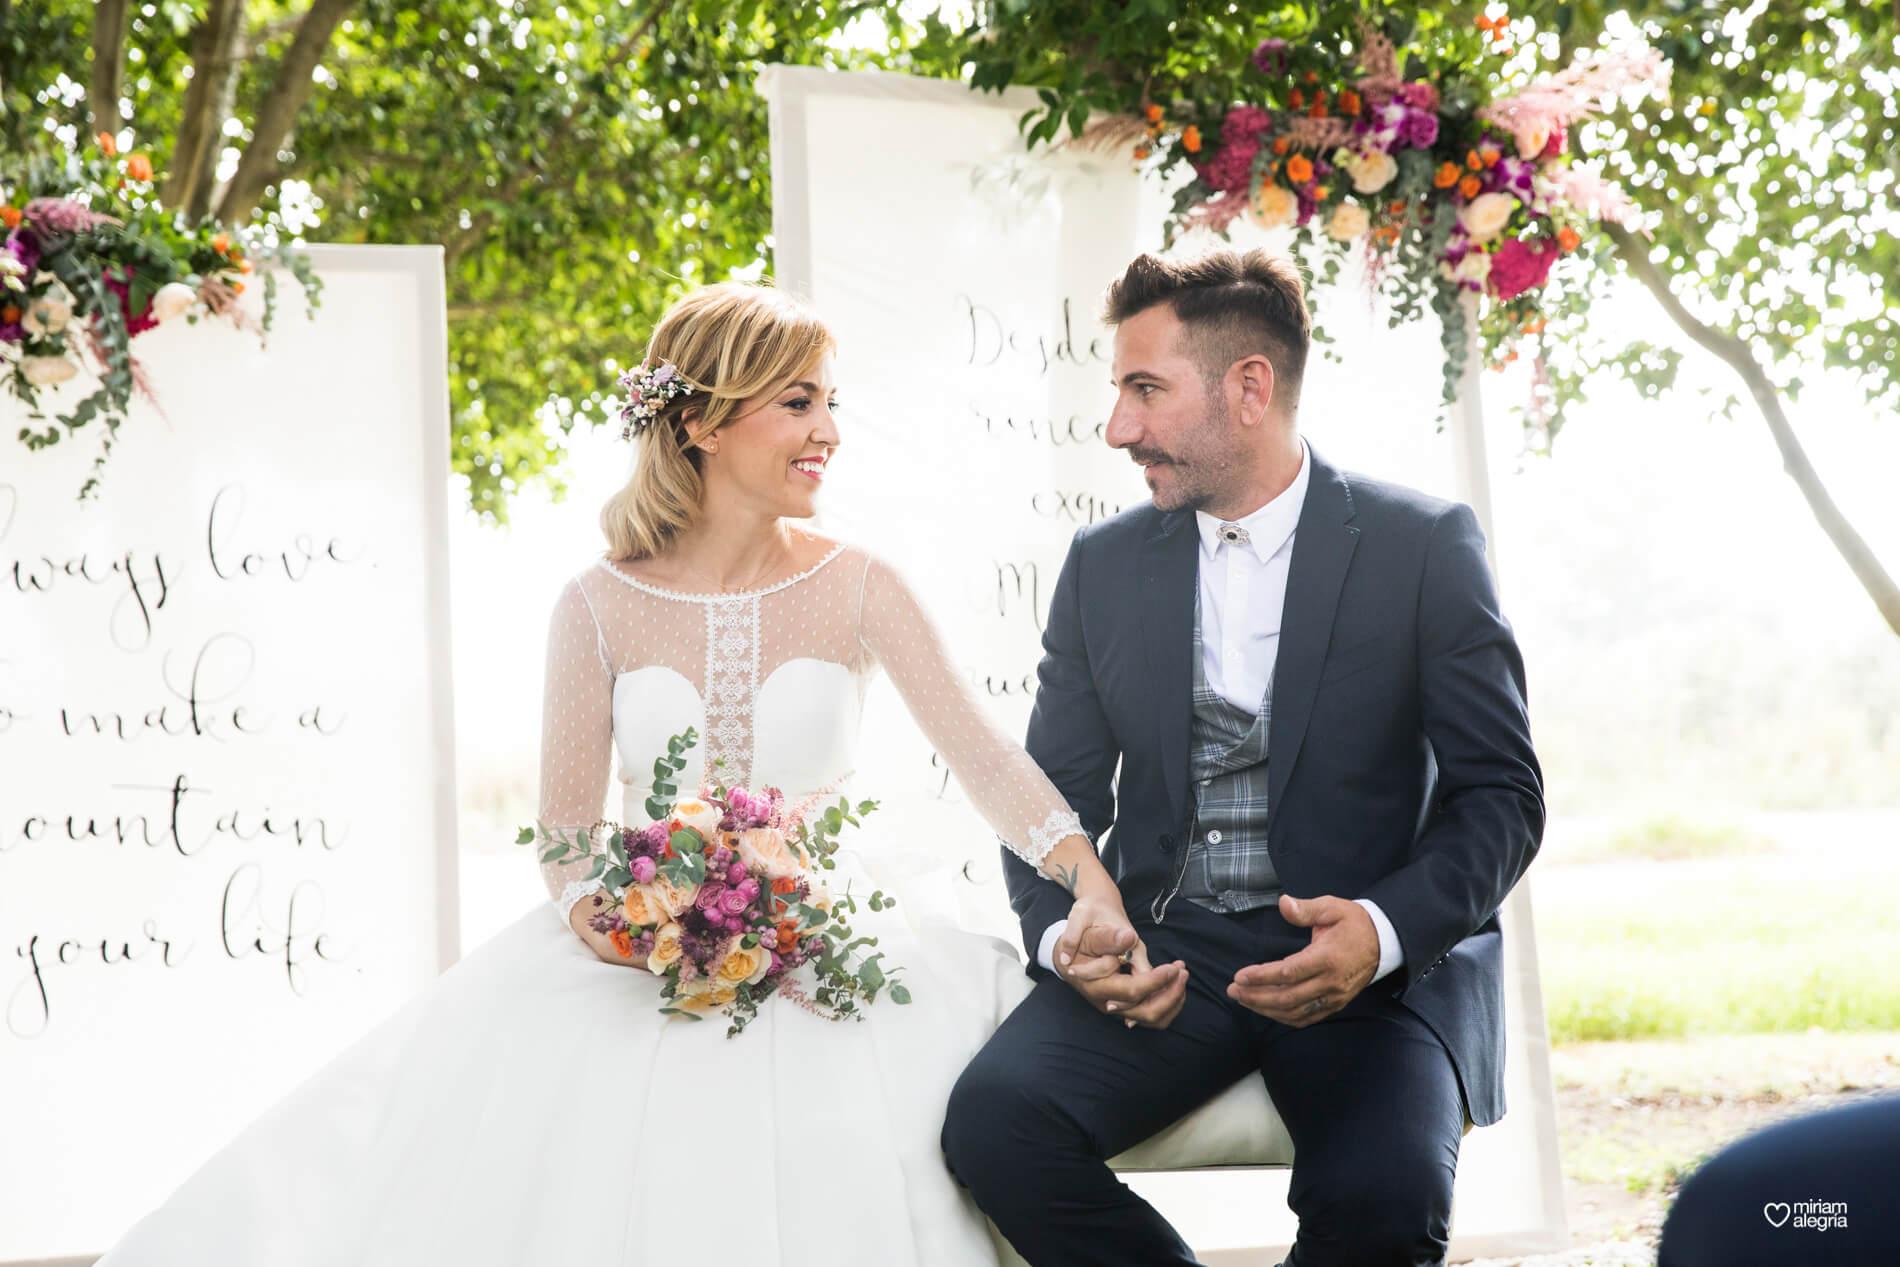 la-boda-de-alemc7-miriam-alegria-fotografos-boda-murcia-45